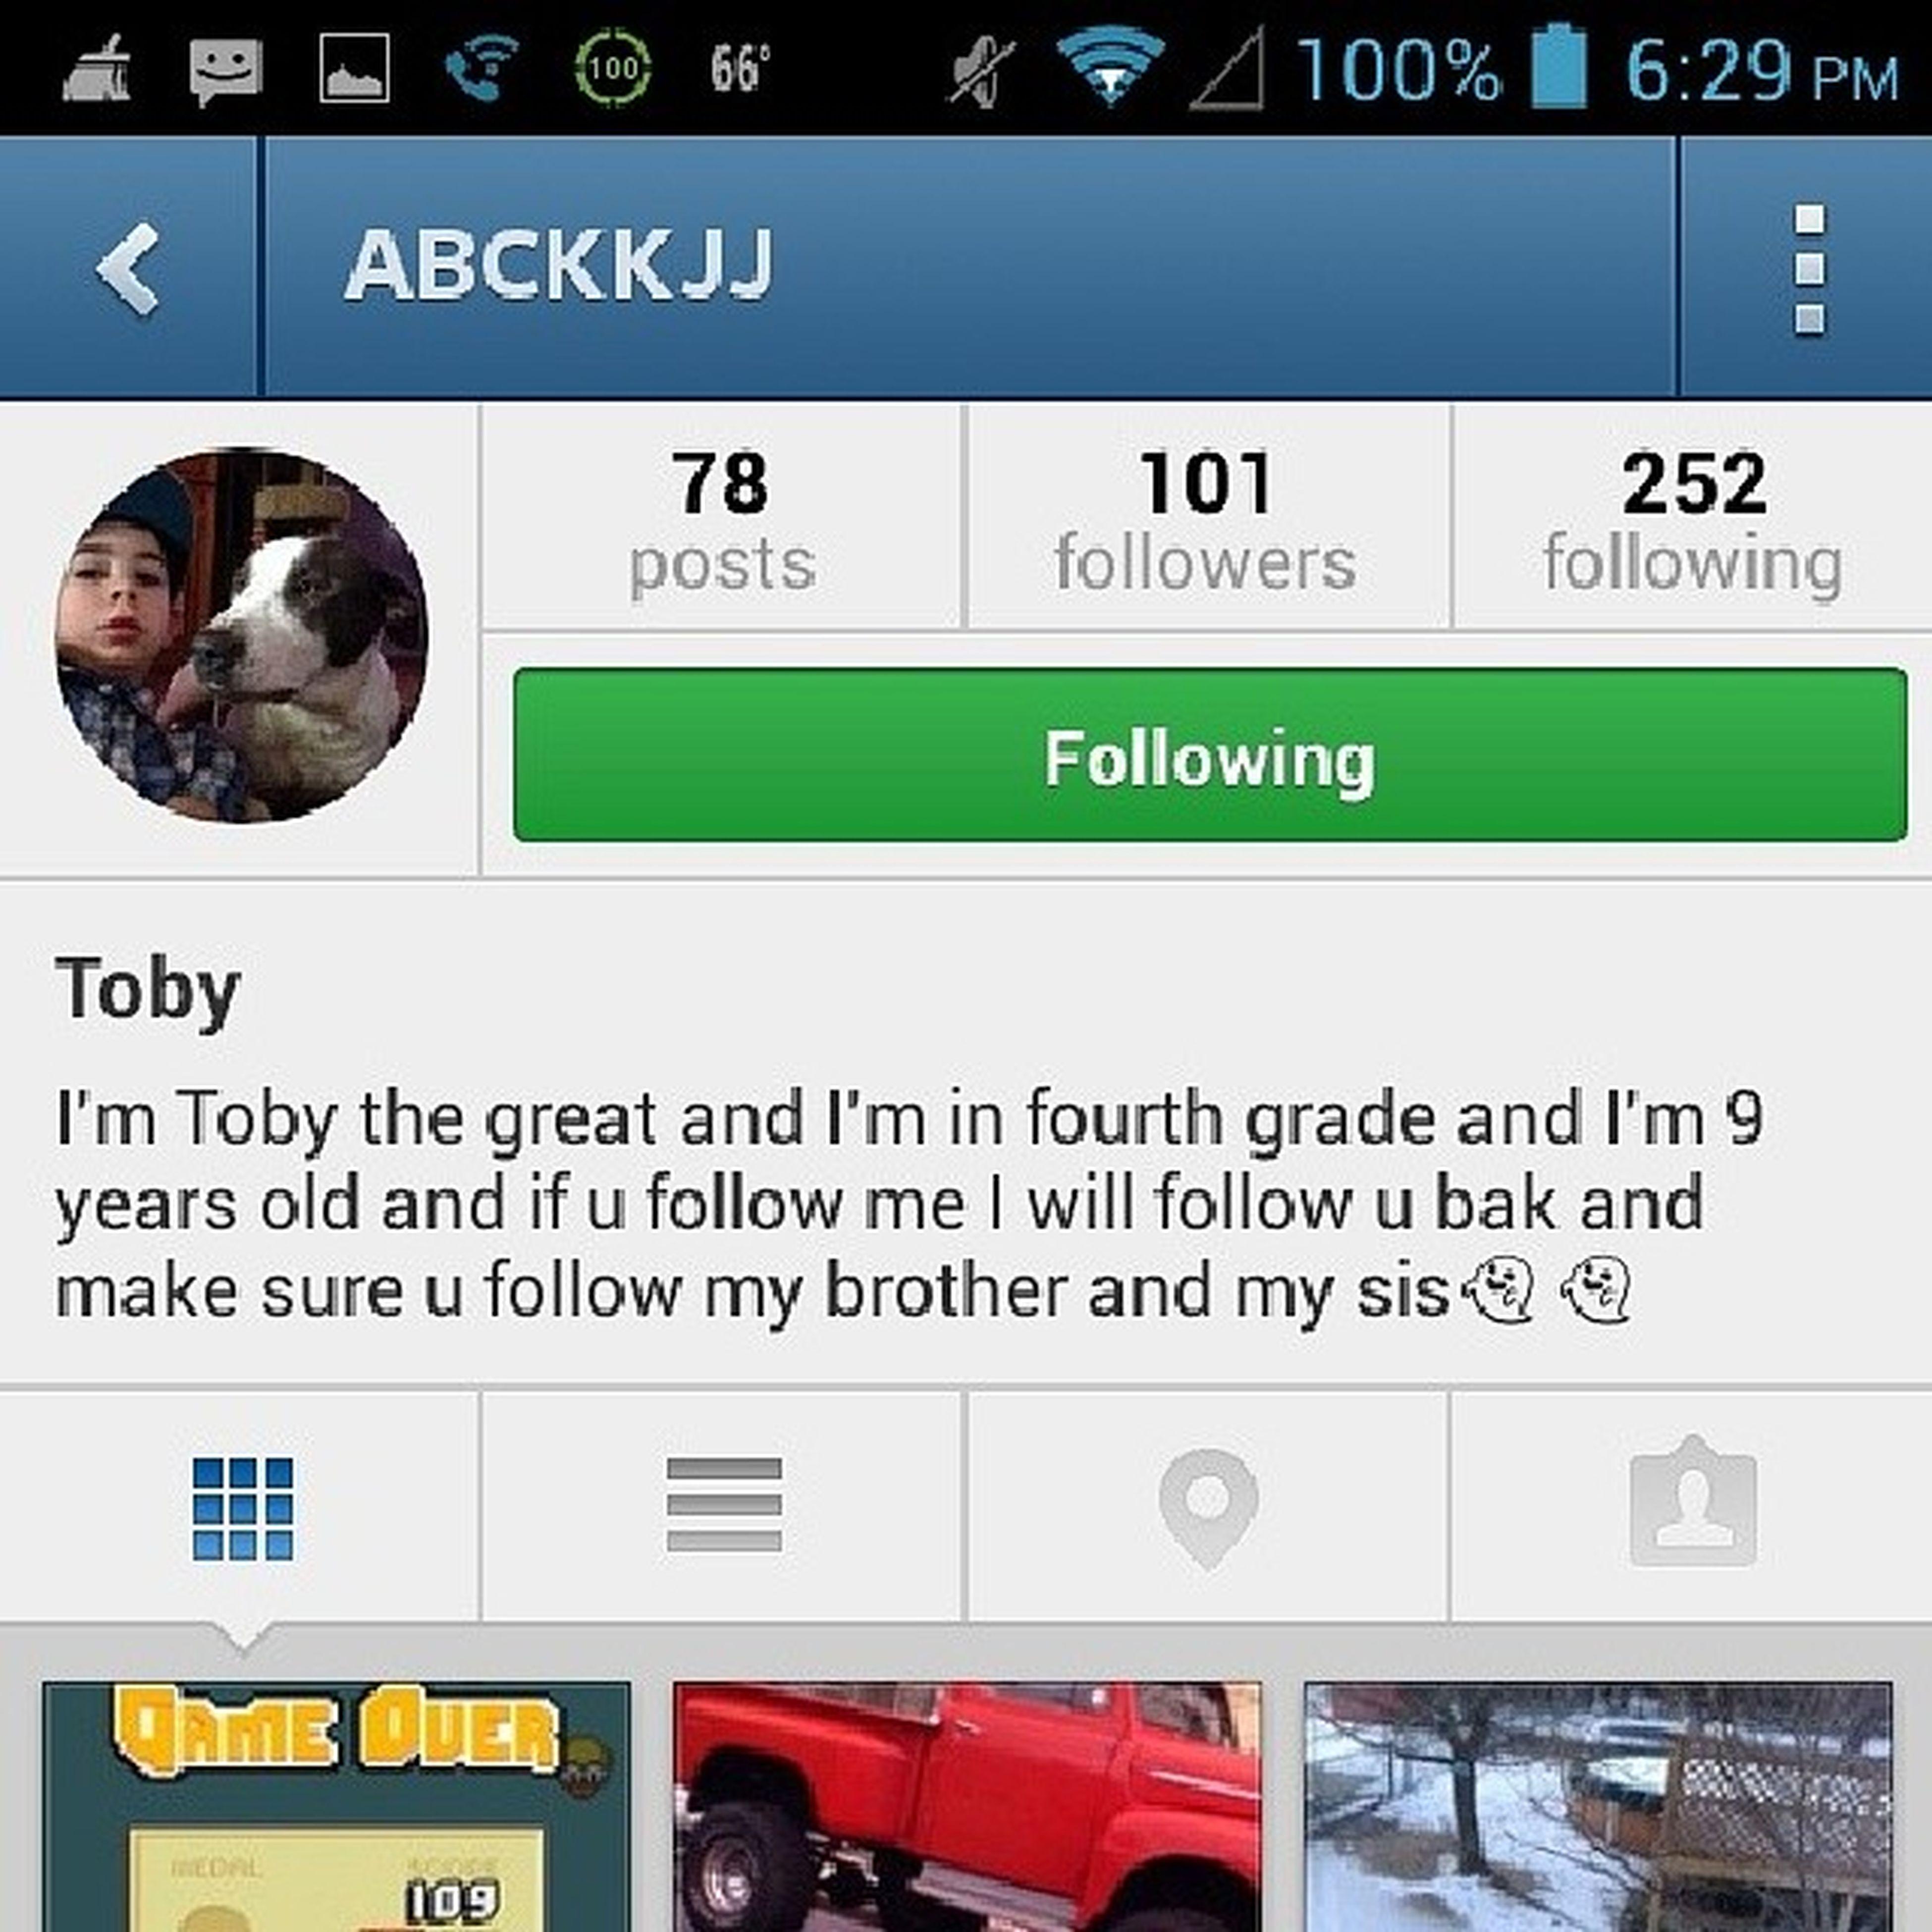 Follow this weird 9 yr old @abckjj Wtfdokidshaveig